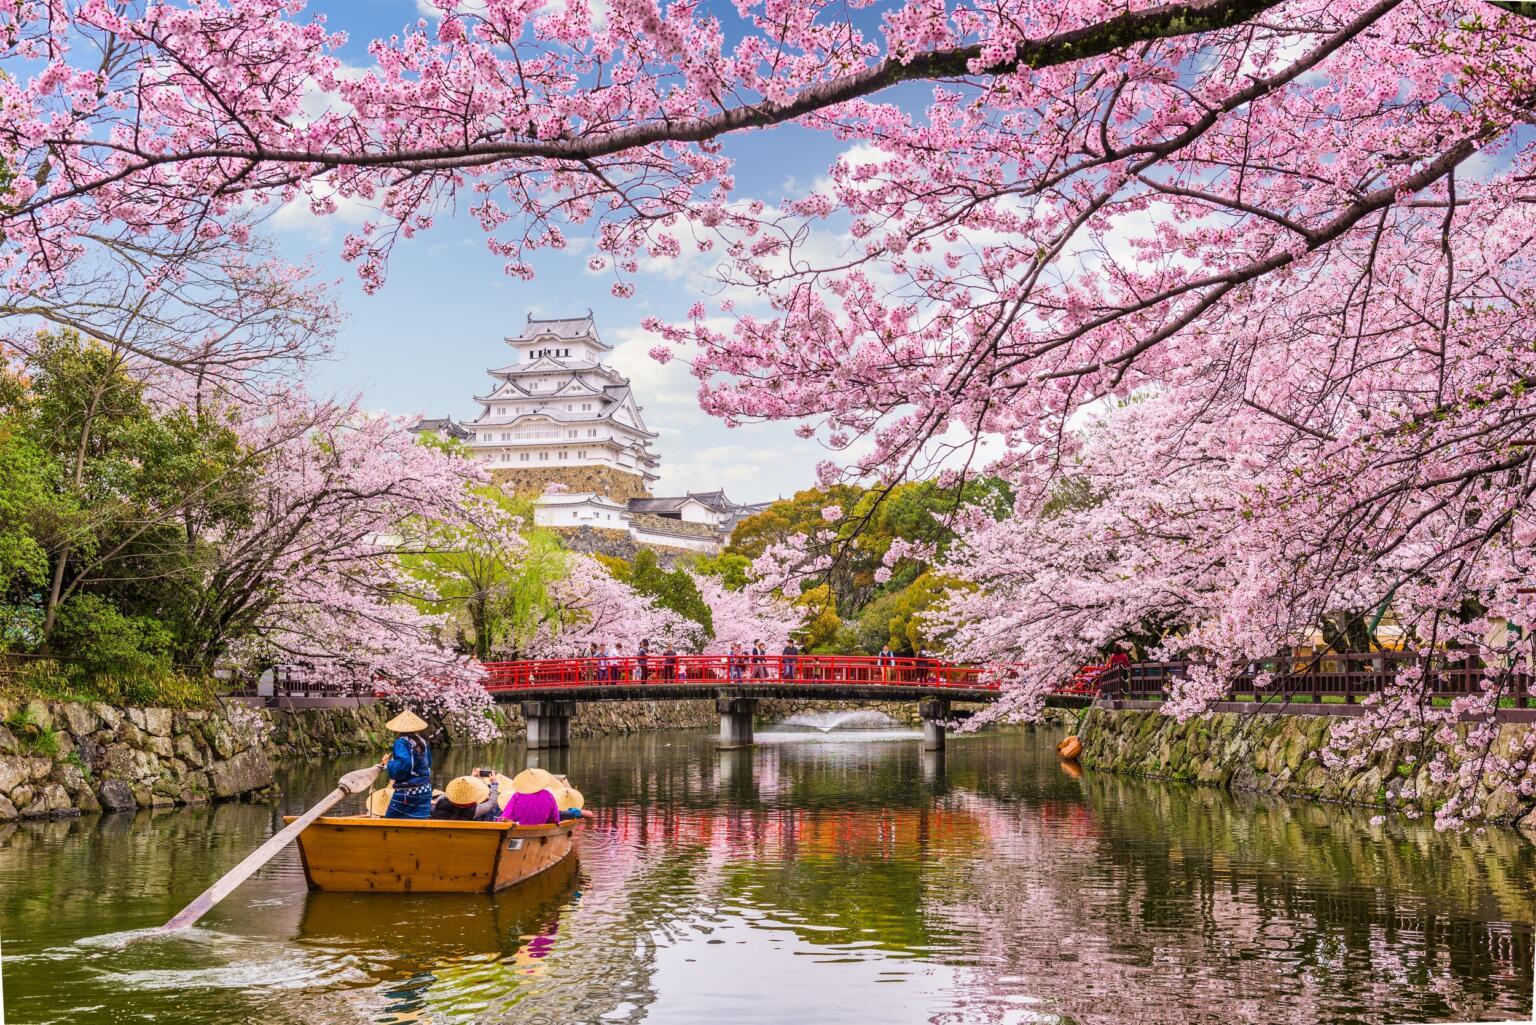 Hiroshima itinerary